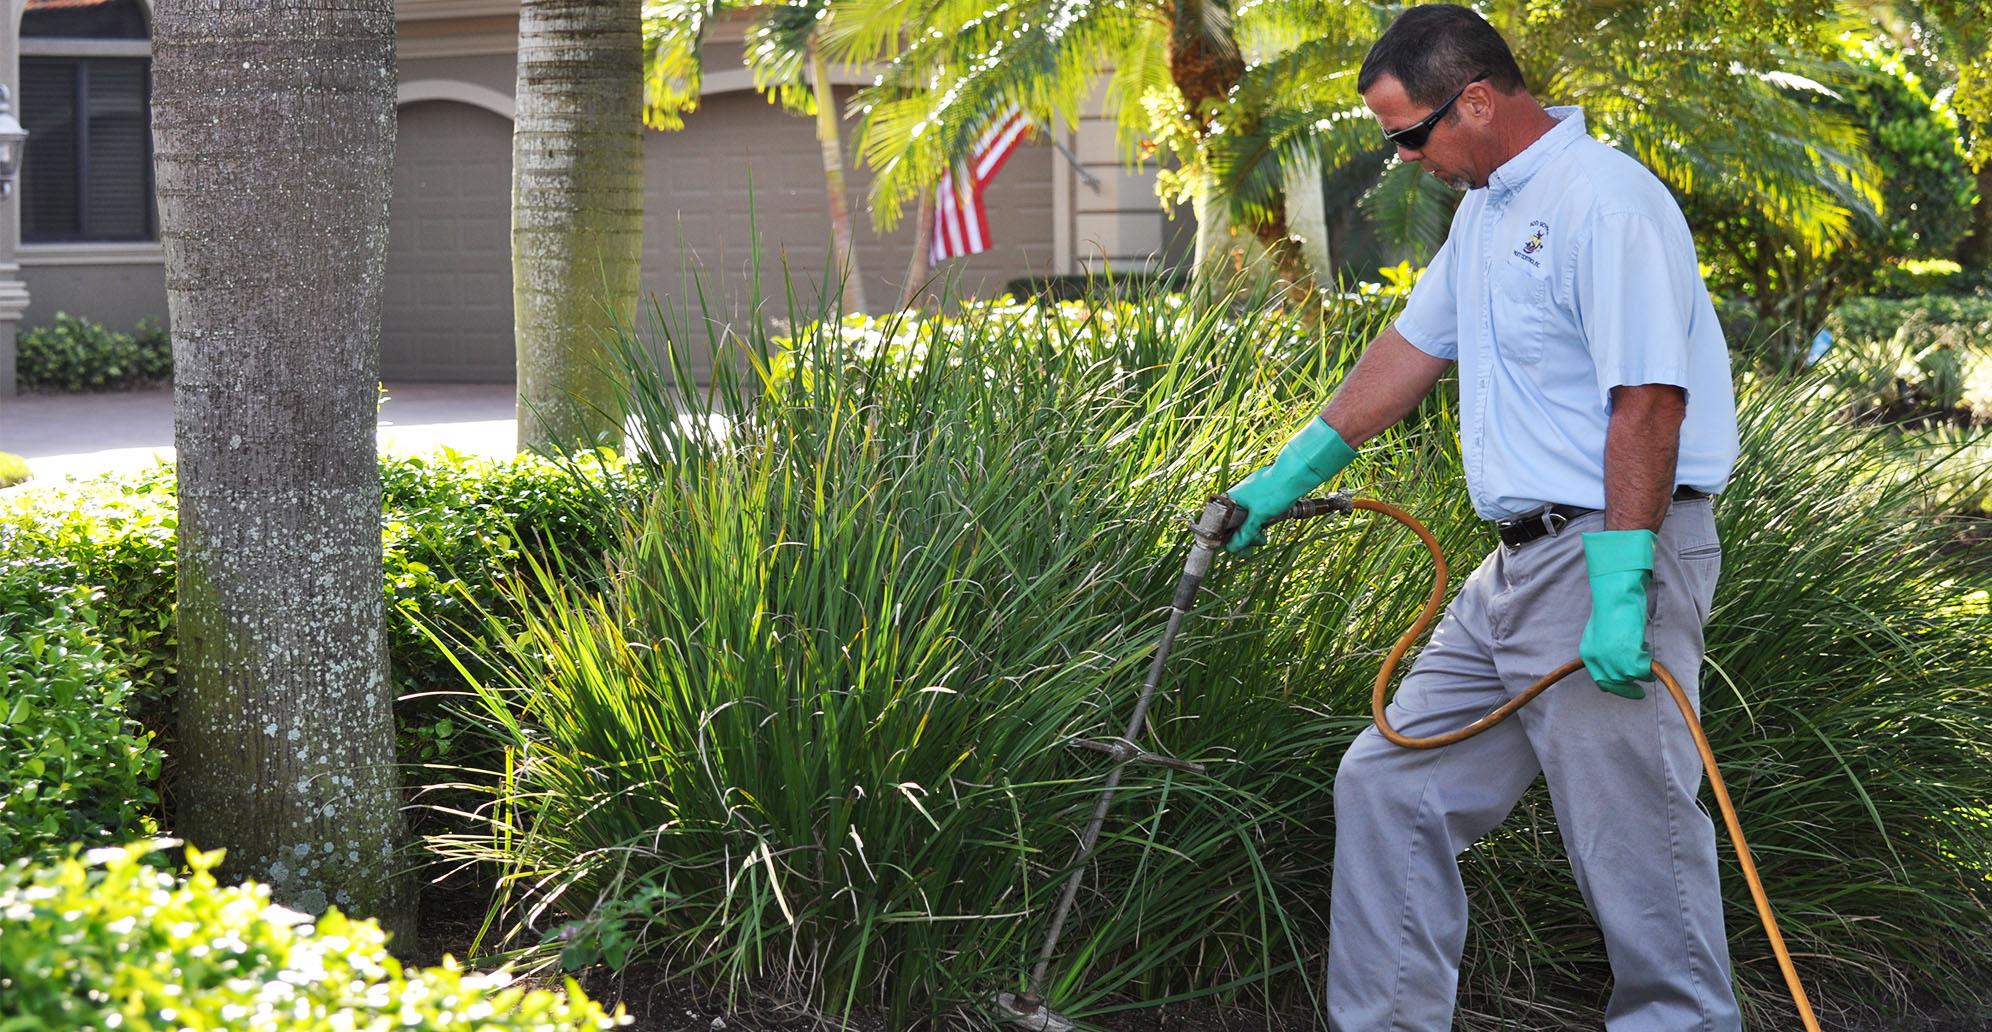 slider-bonvoyage-pest-control-lawn